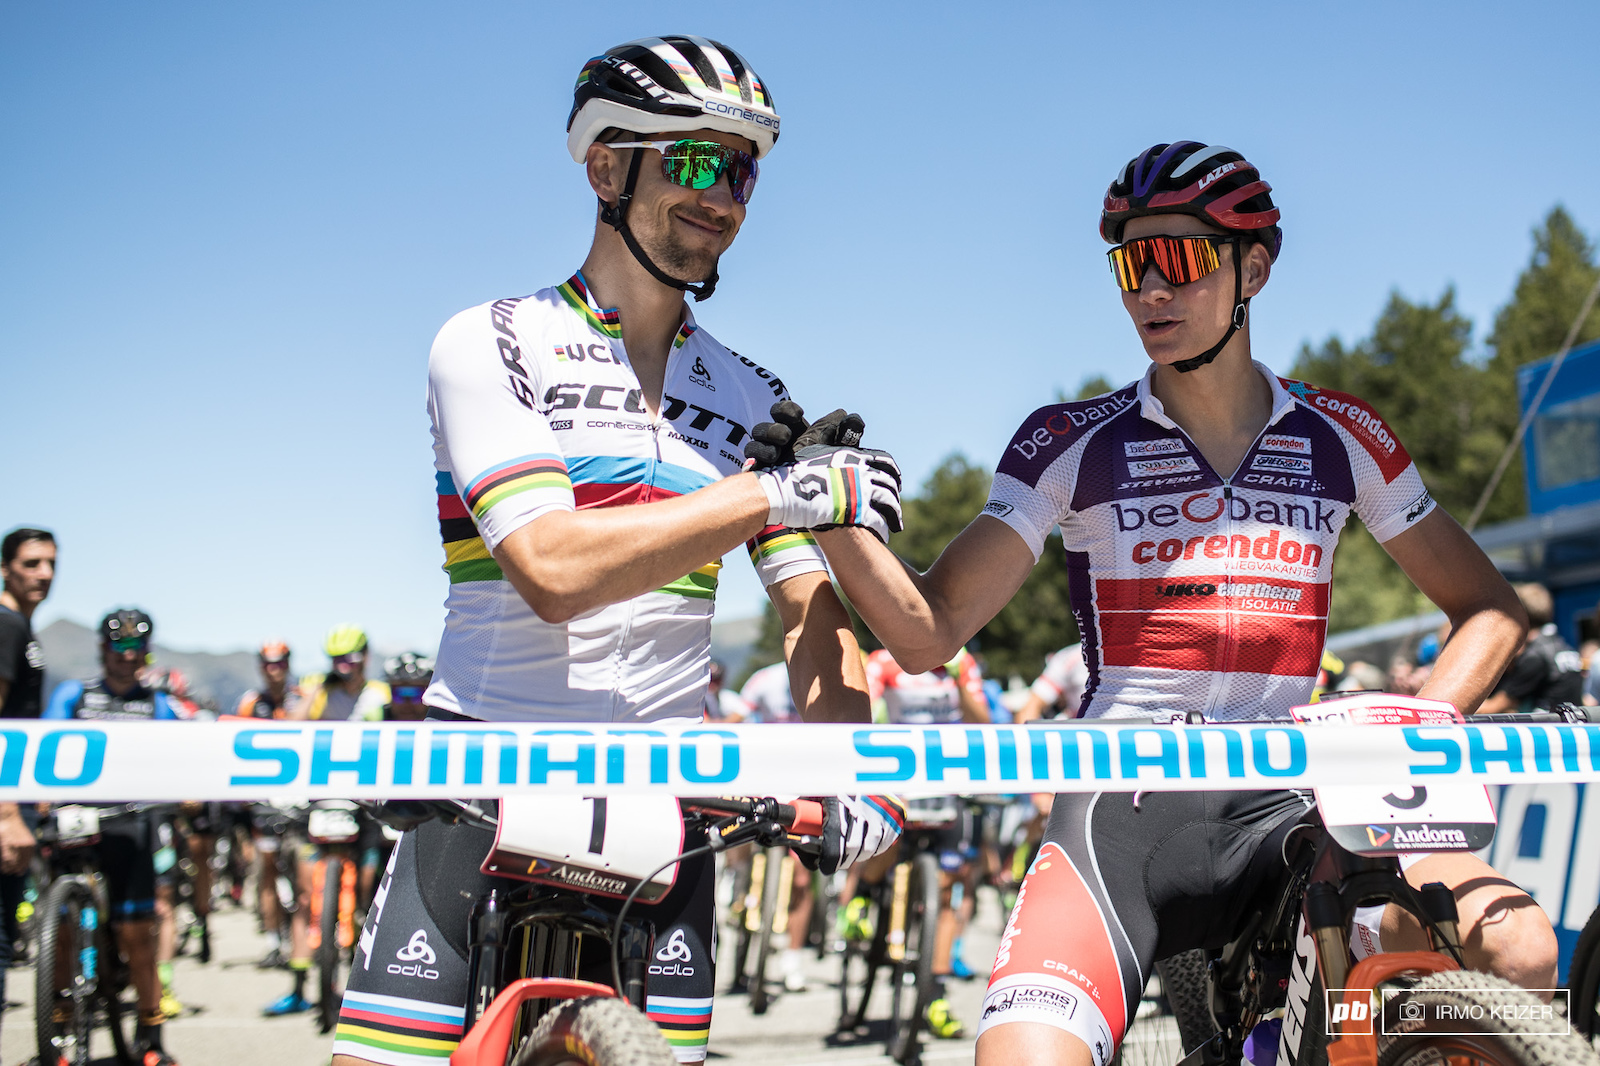 Mathieu van der Poel r caused quite the stir as he challenged Schurter s dominance in Albstadt. Today Schurter showed the world his class.